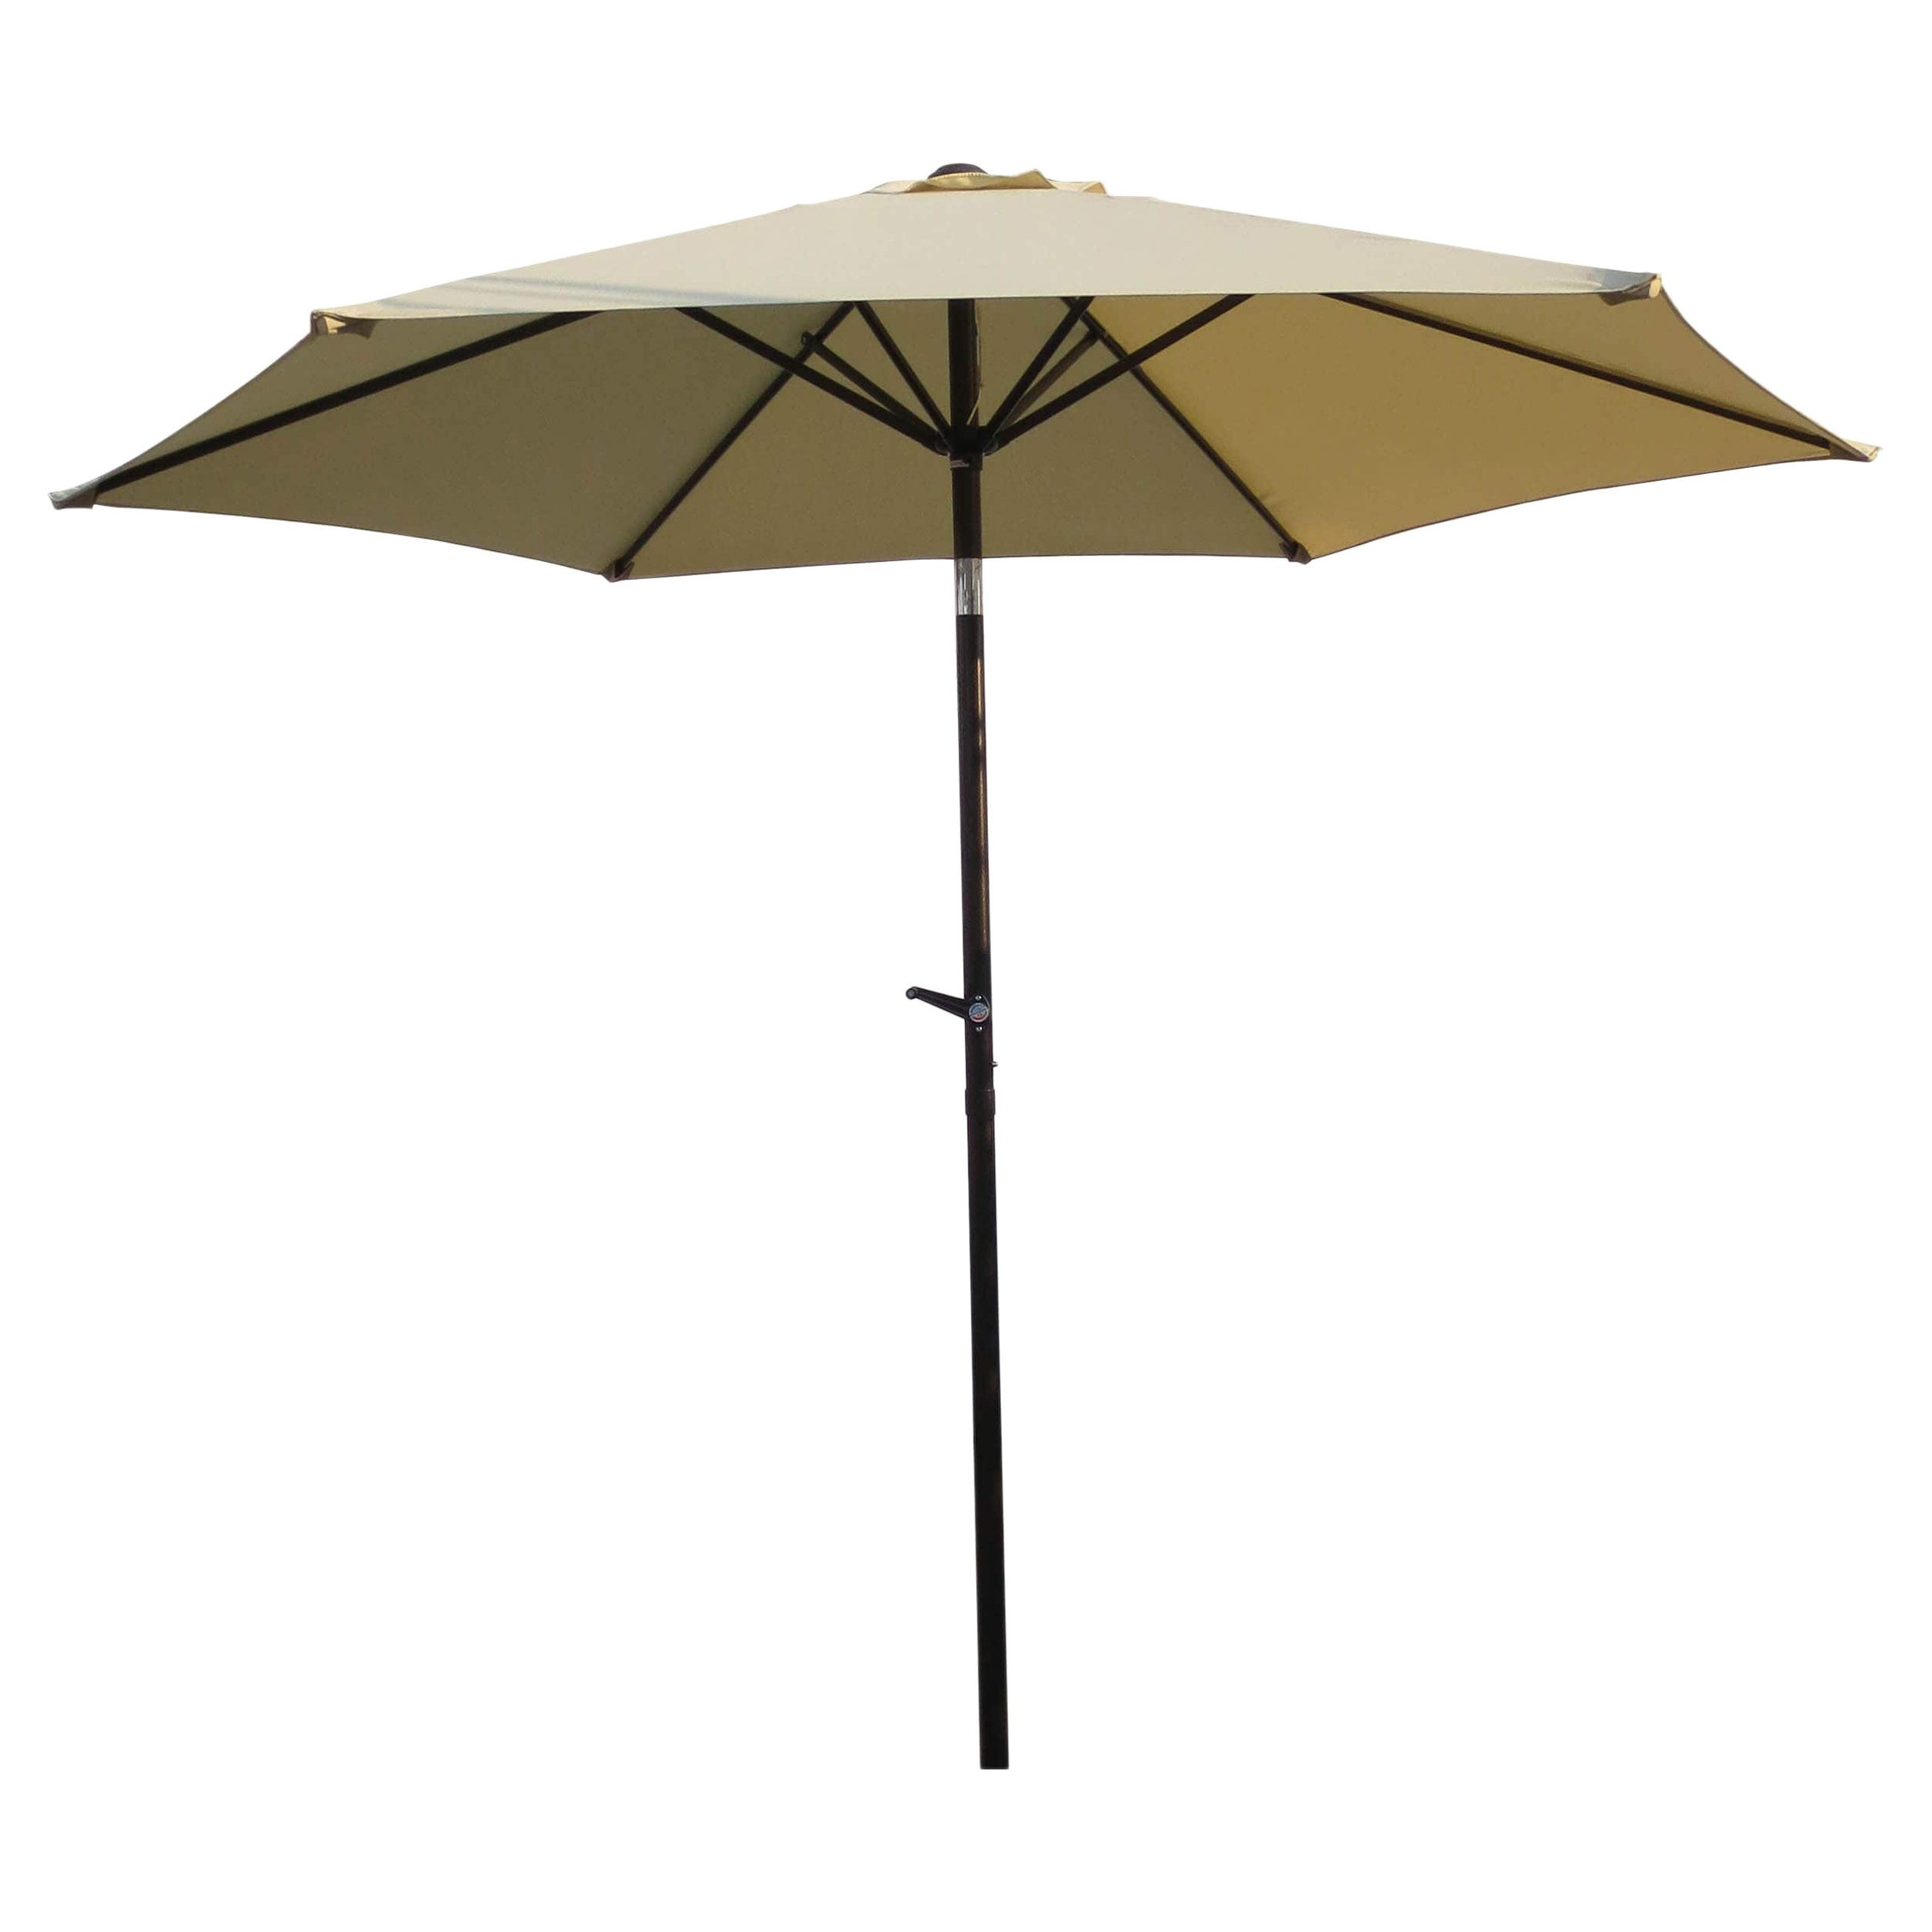 2019 Frome Market Umbrellas In Patio Umbrella 8 Foot (View 1 of 20)